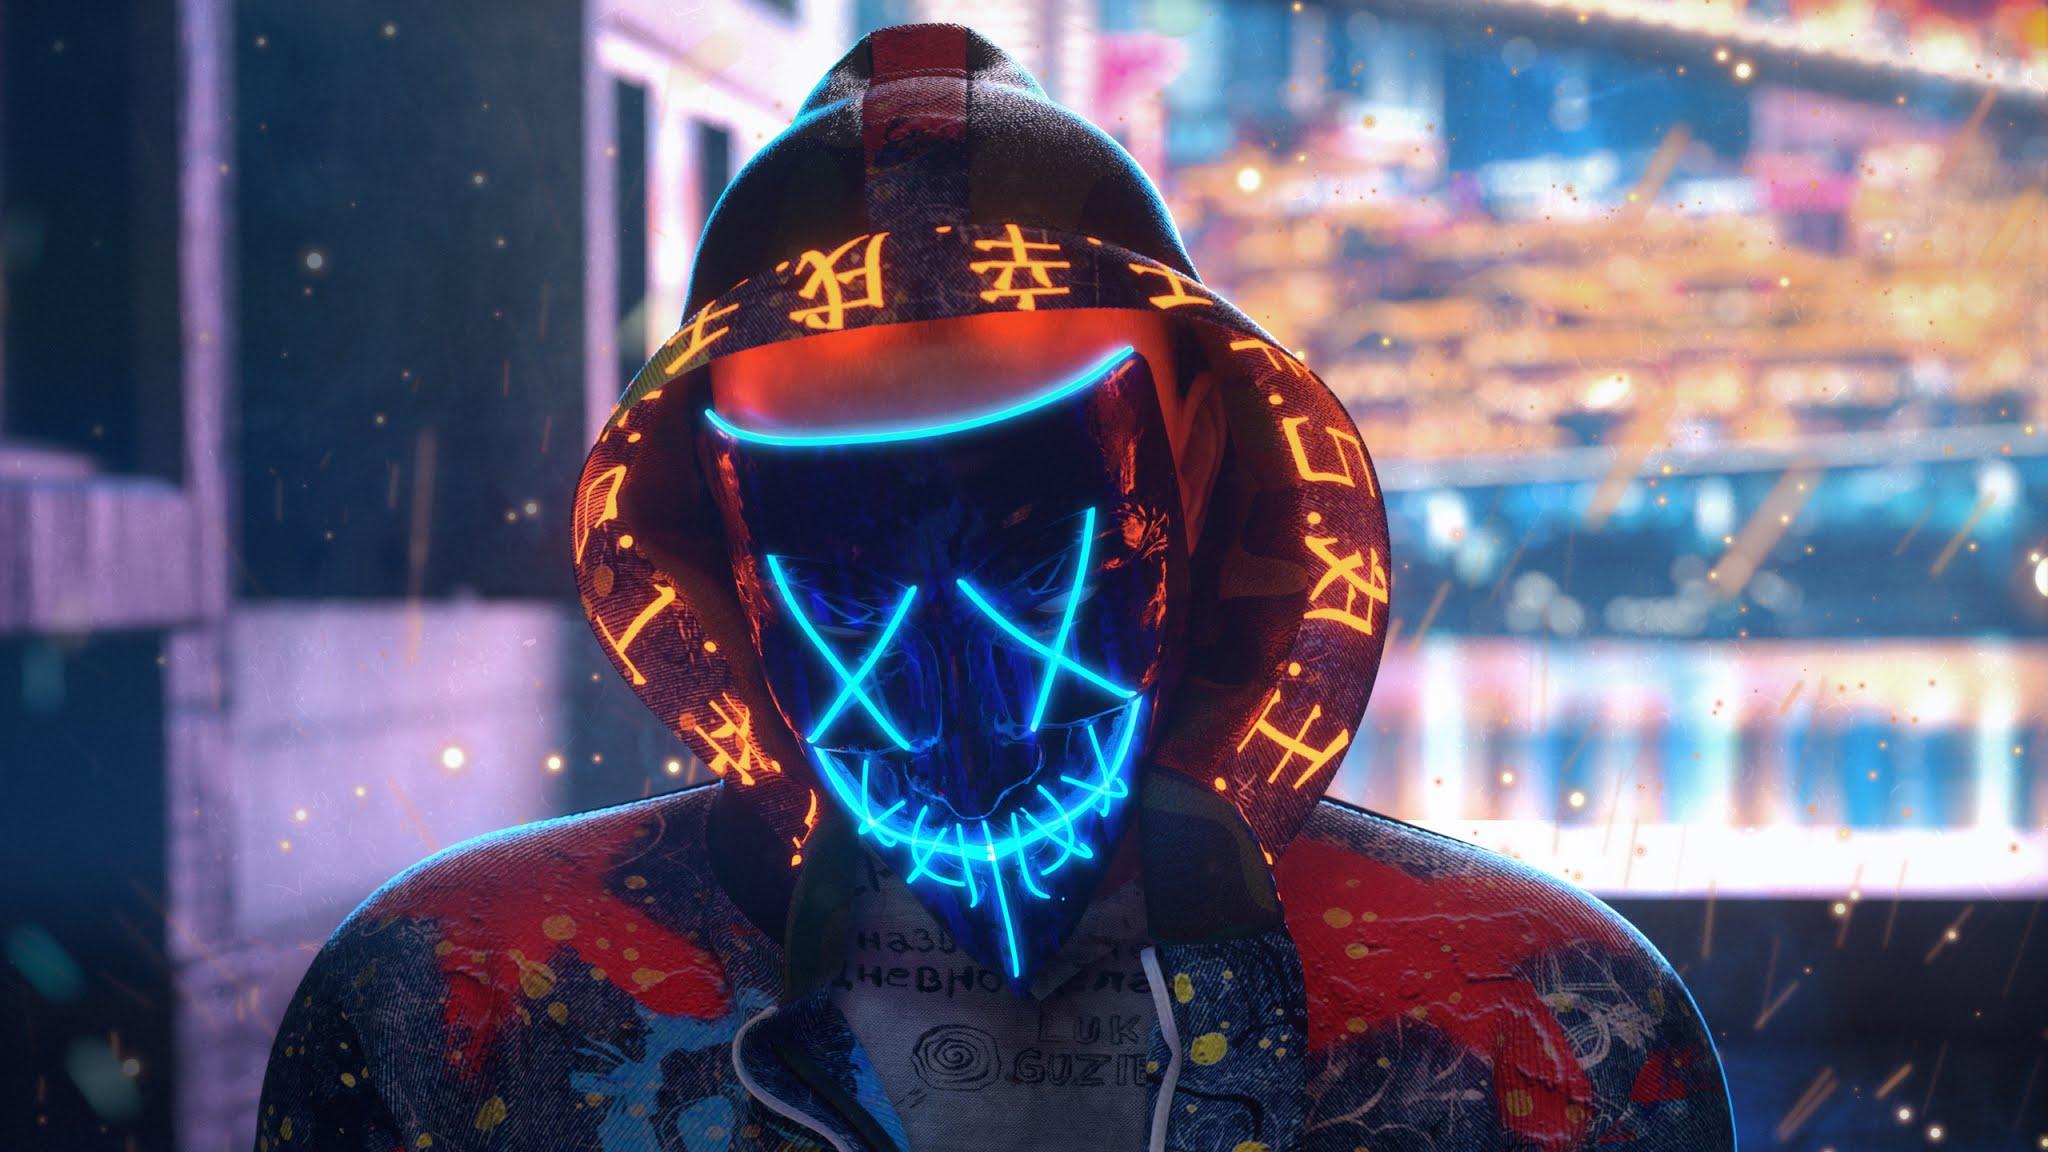 Mask Neon Guy Chakra Wallpaper